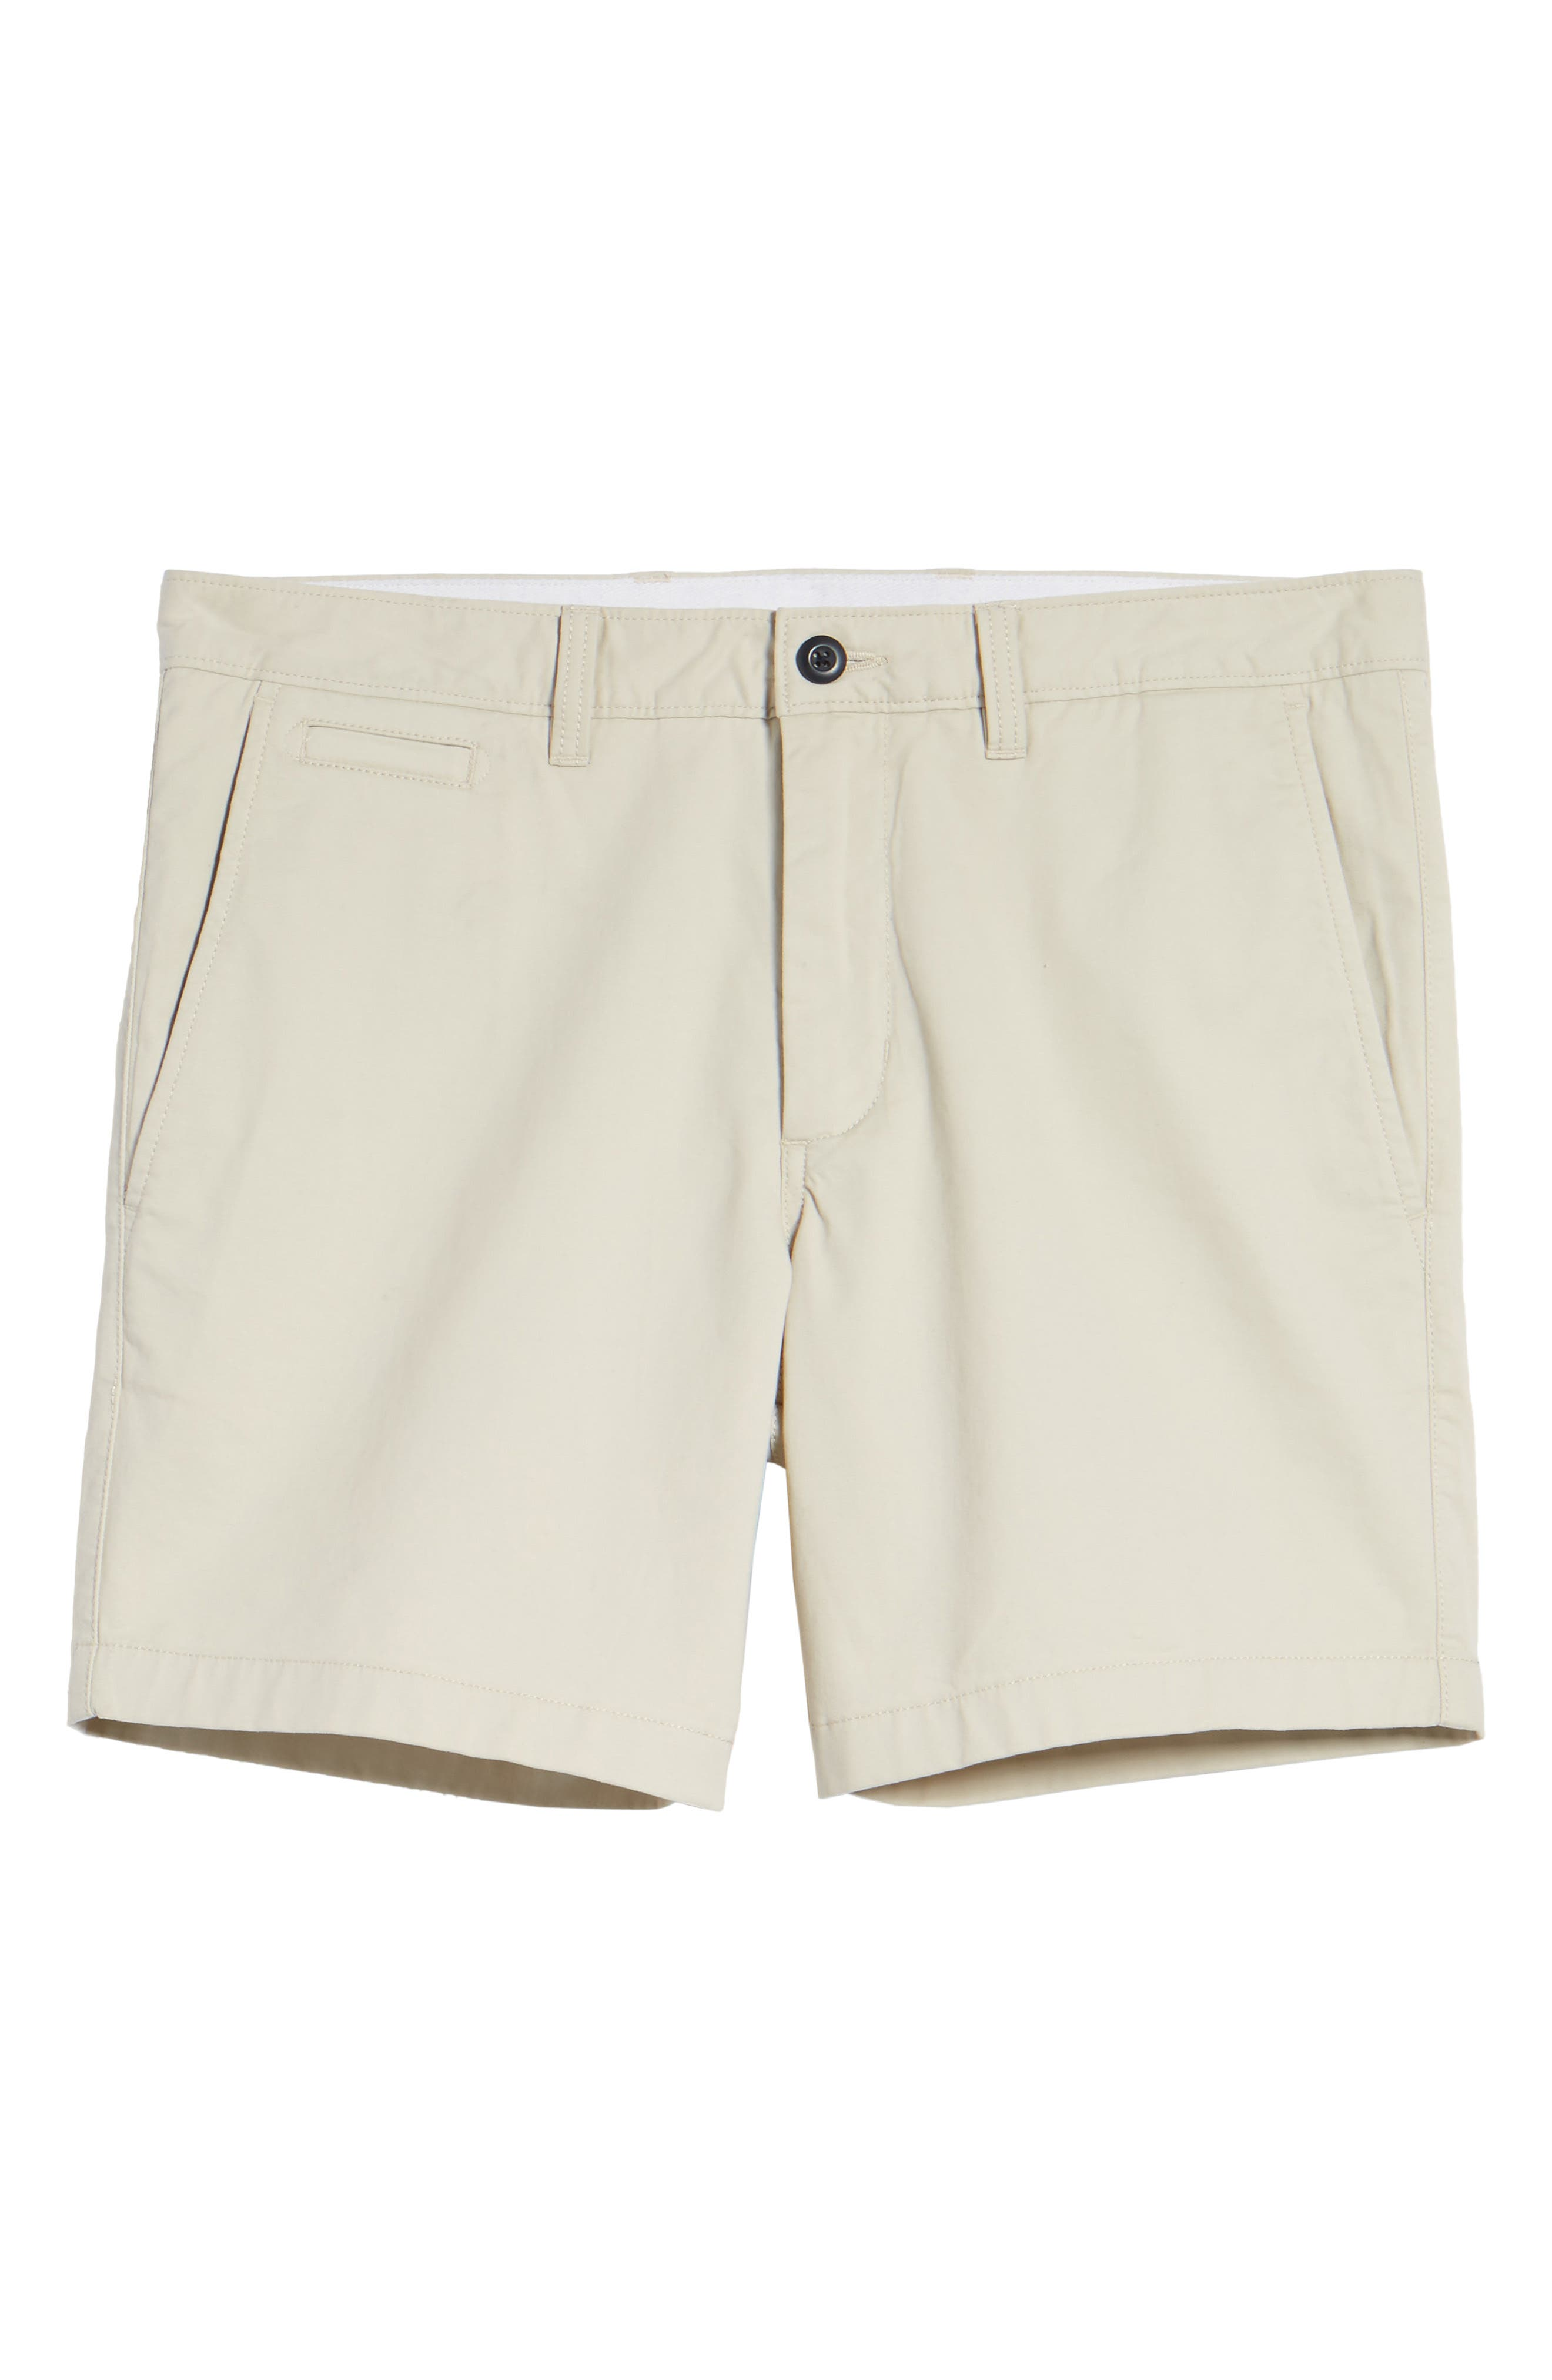 Ballard Slim Fit Stretch Chino 7-Inch Shorts,                             Alternate thumbnail 64, color,